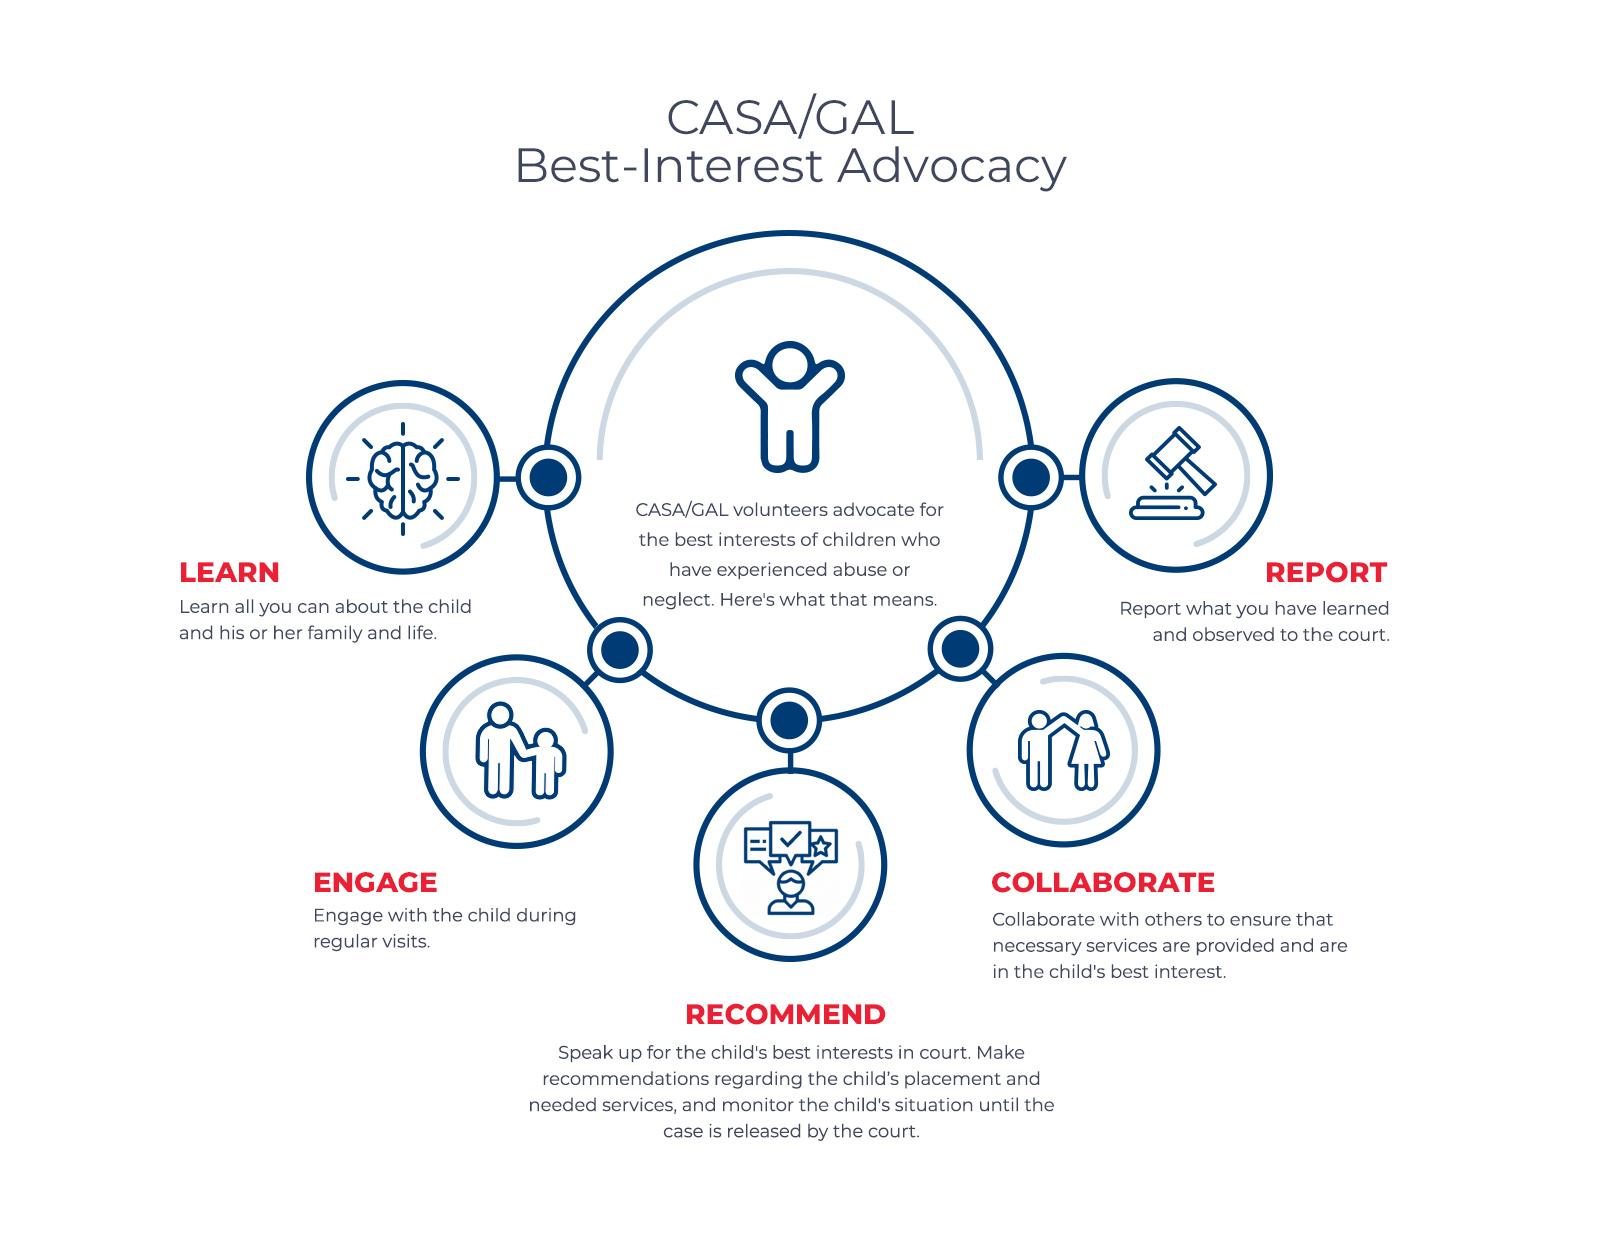 CASAGAL-Infographic-Model